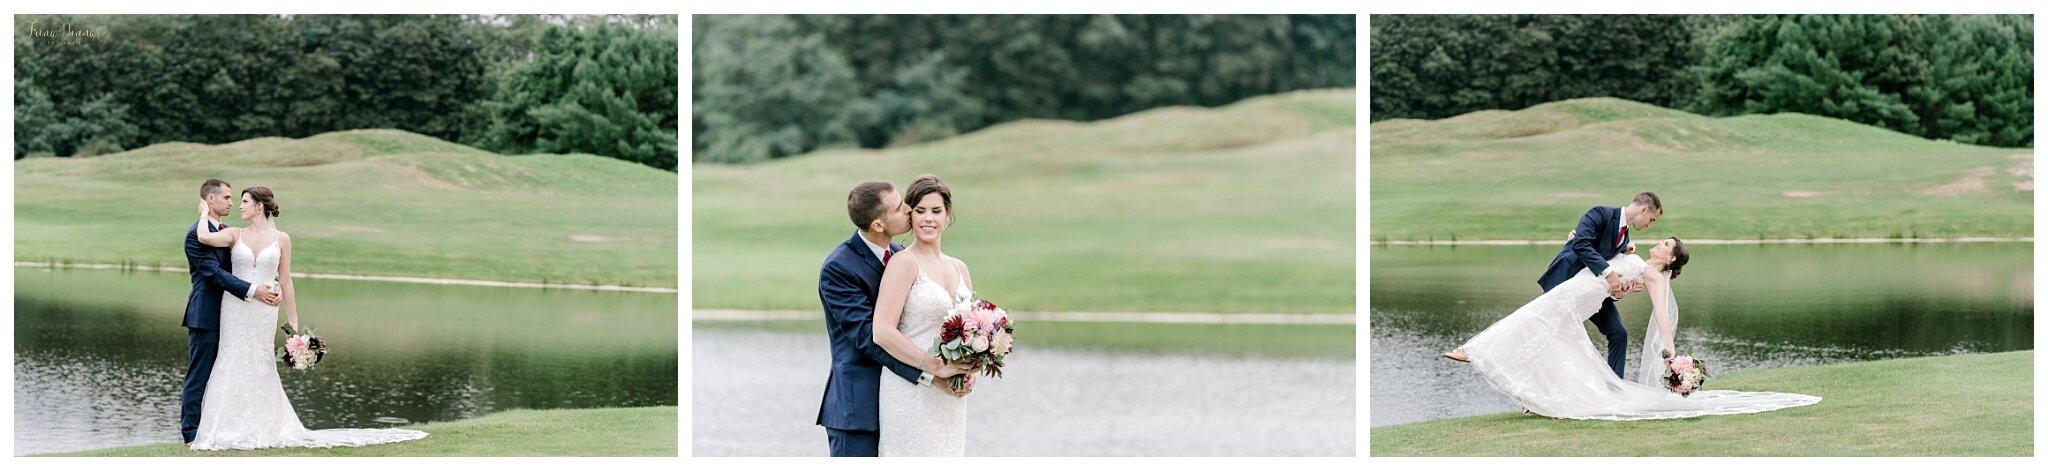 Maine Golf Course Club Wedding Photos